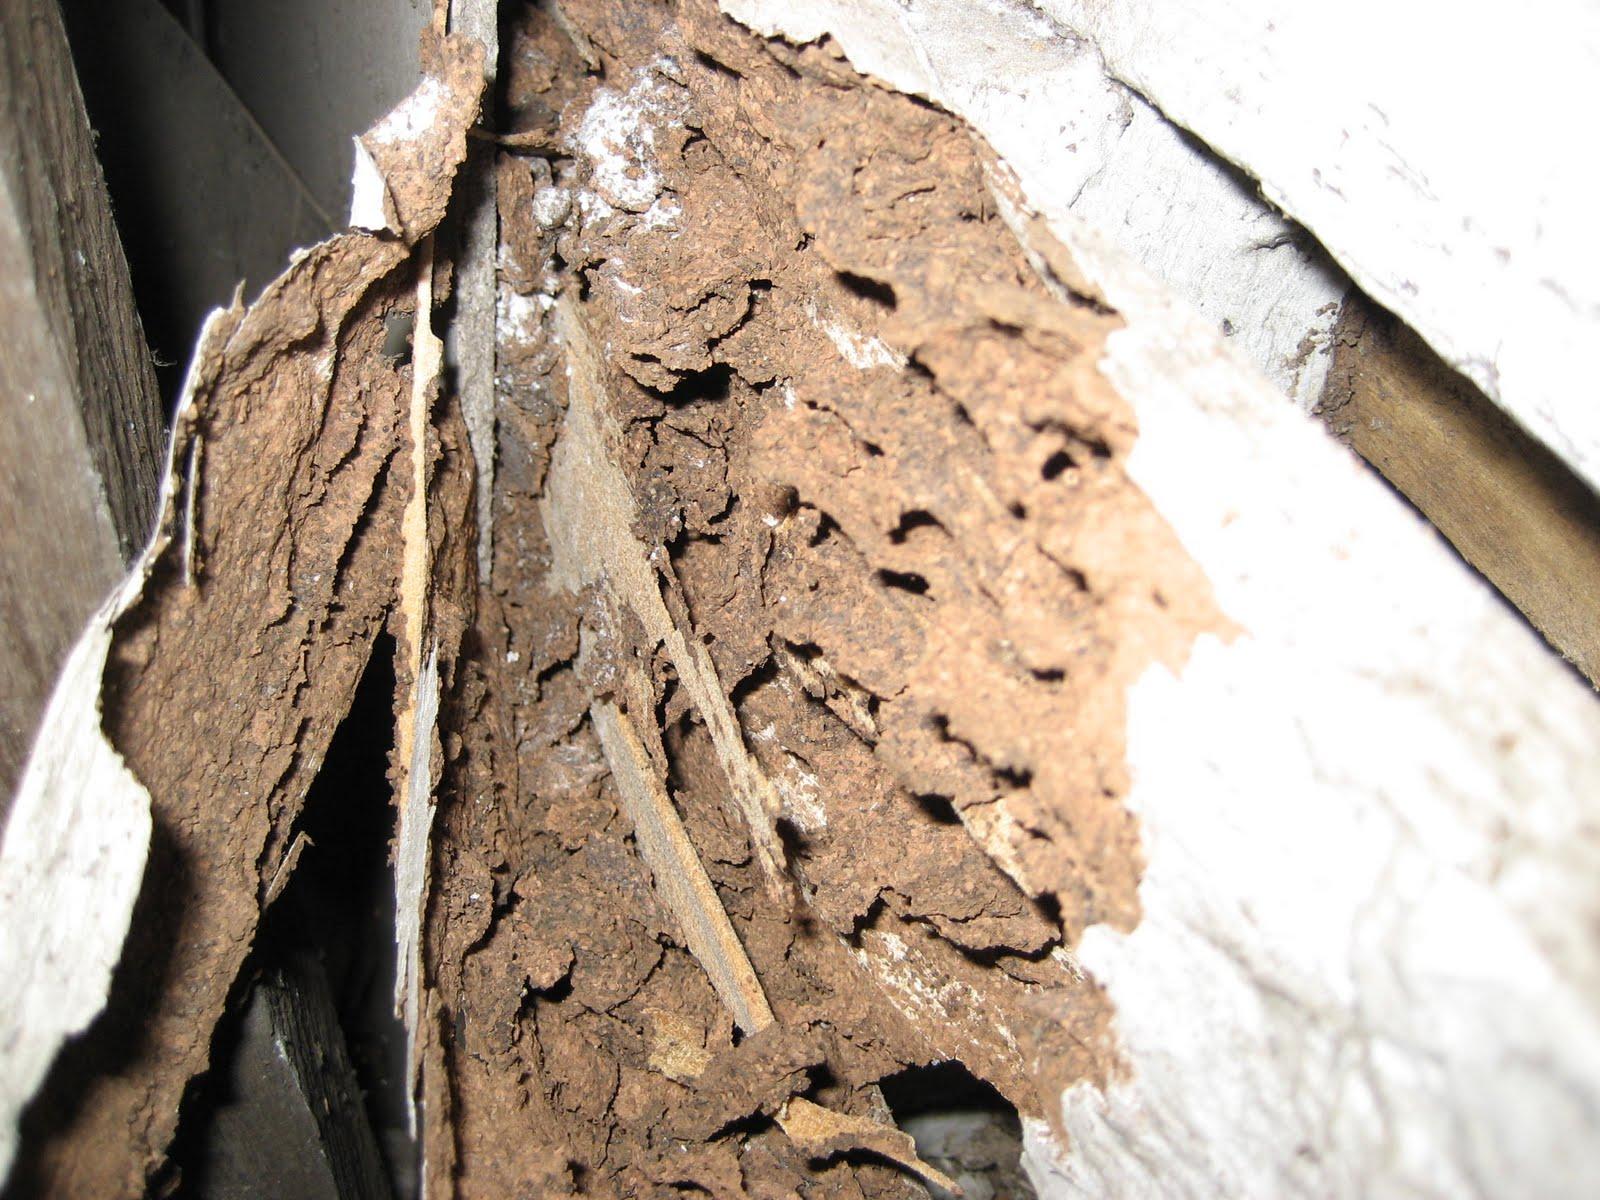 Termite Inspection Annual Termite Inspection Cost